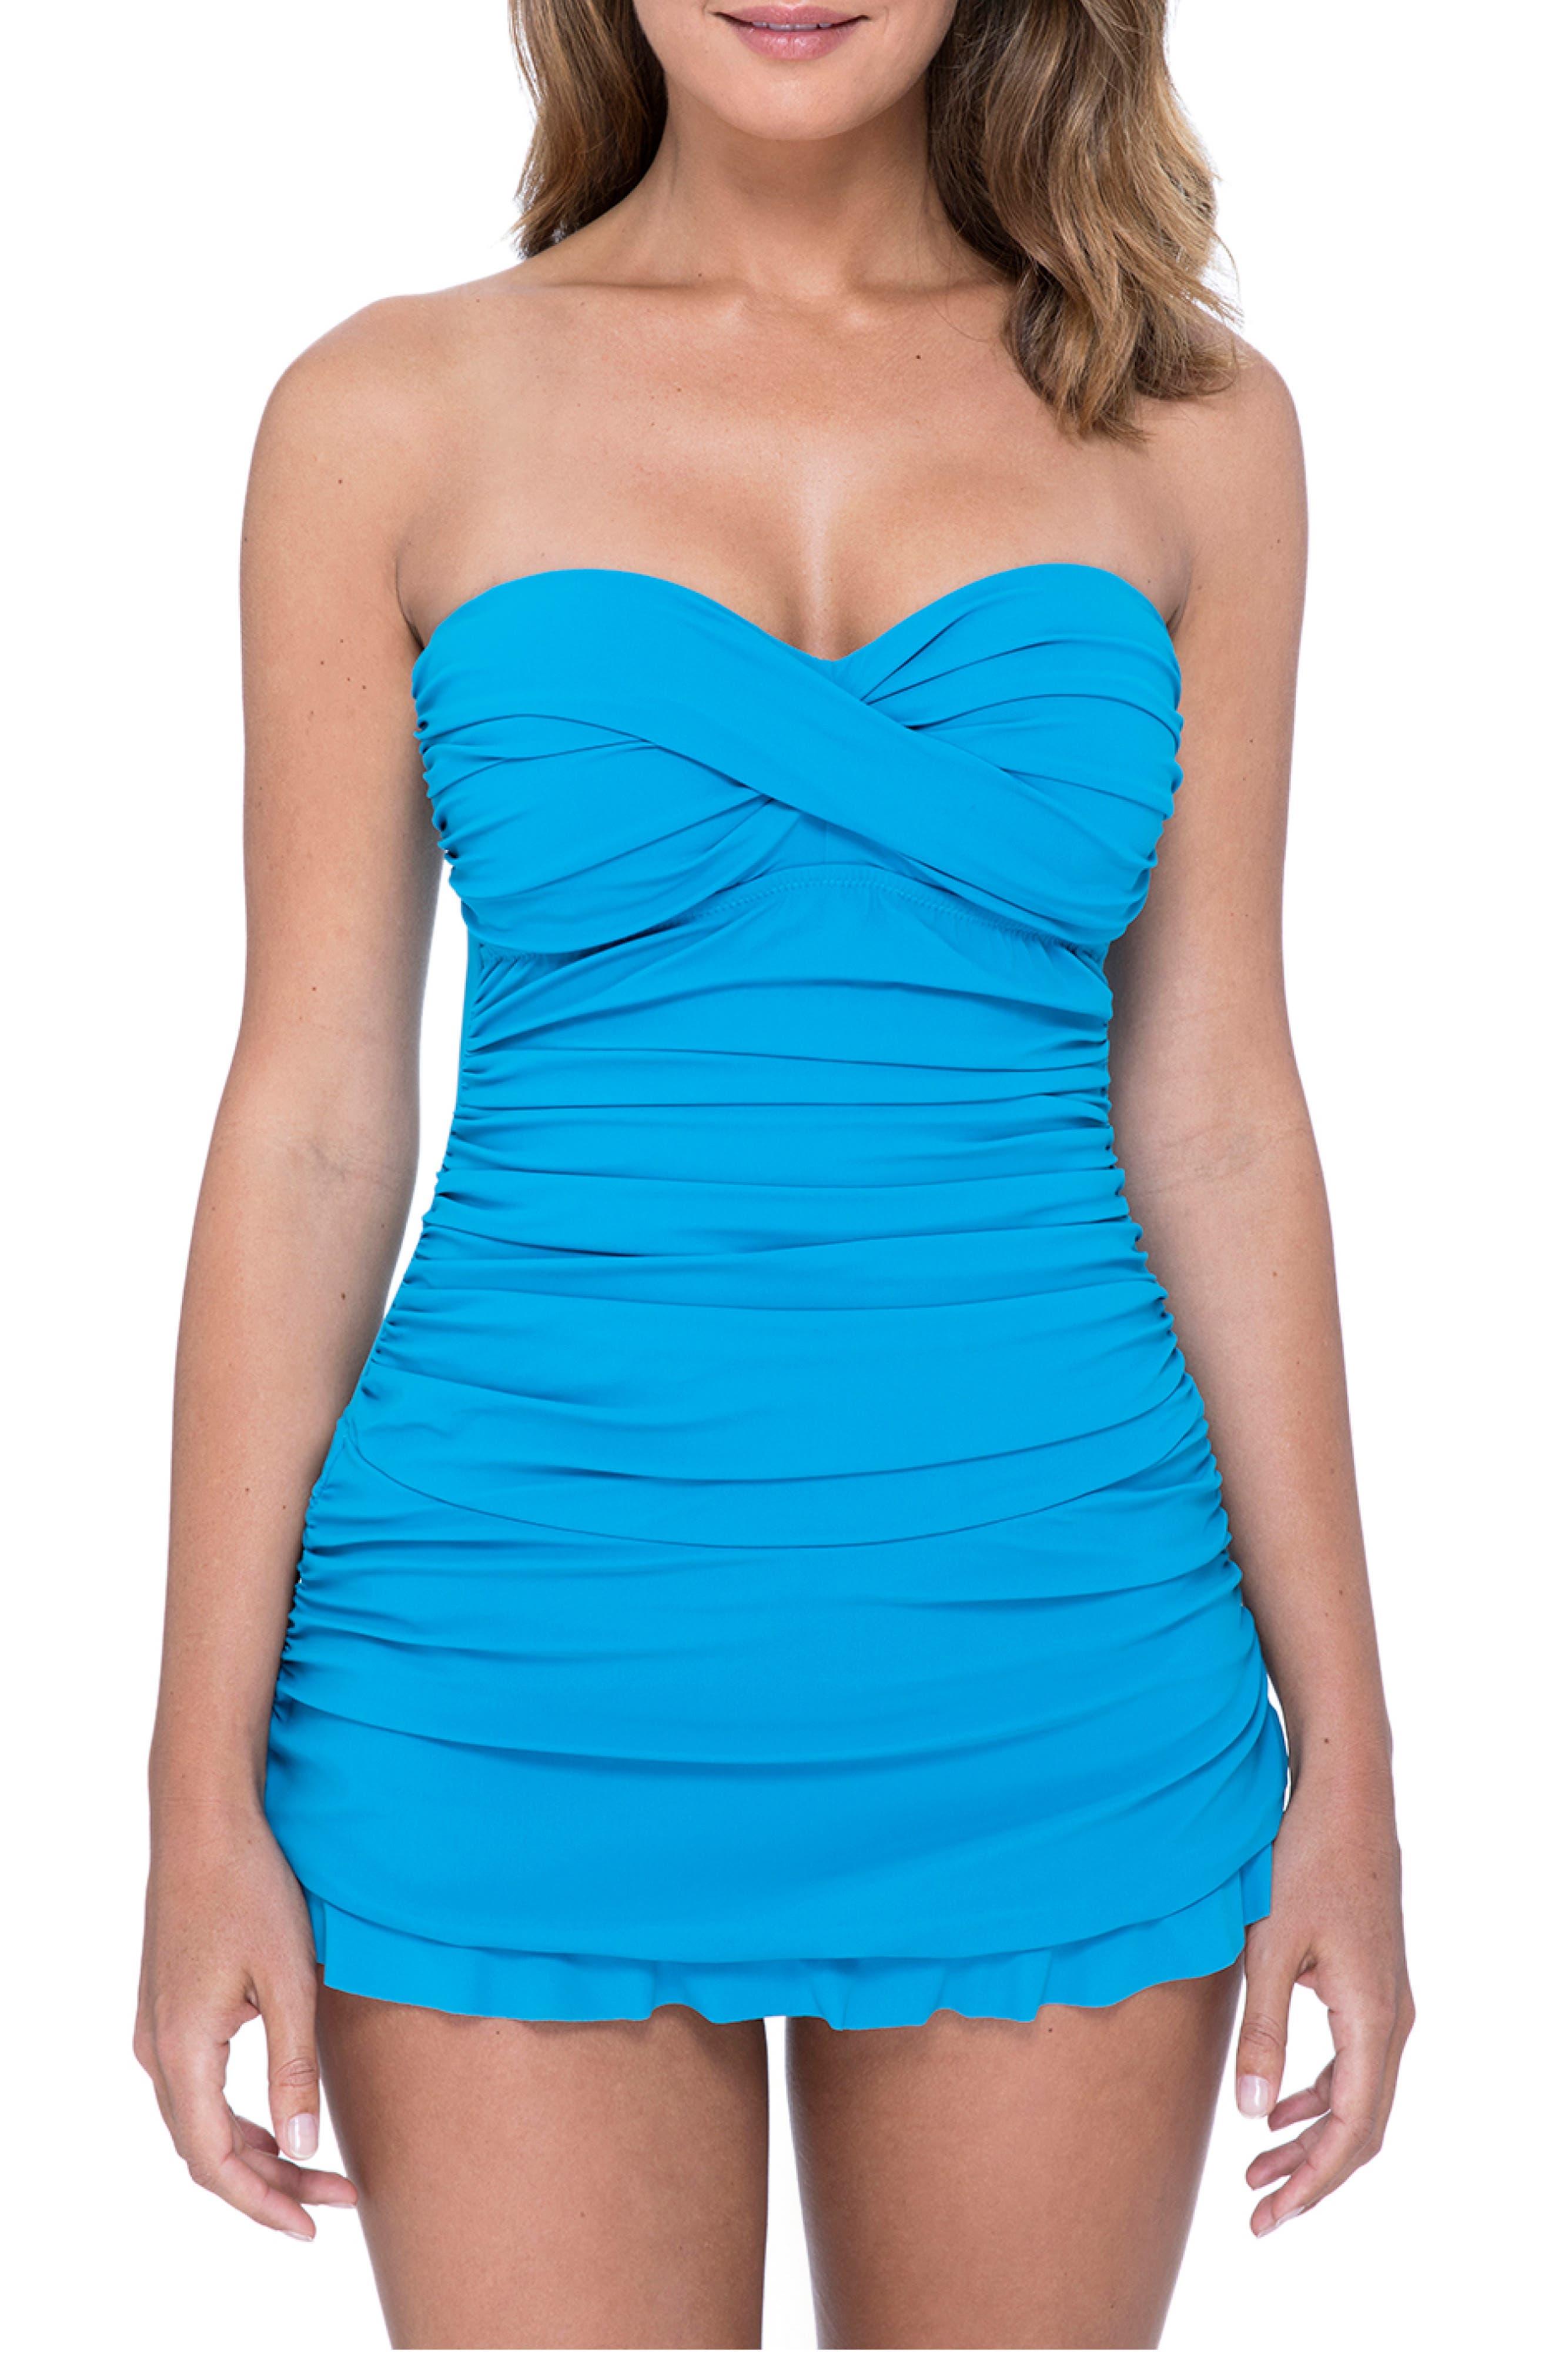 1950s Swimsuits, 50s Bathing Suits, Retro Swimwear Womens Profile By Gottex Tutti Frutti Swim Dress Size 14 - Bluegreen $128.00 AT vintagedancer.com